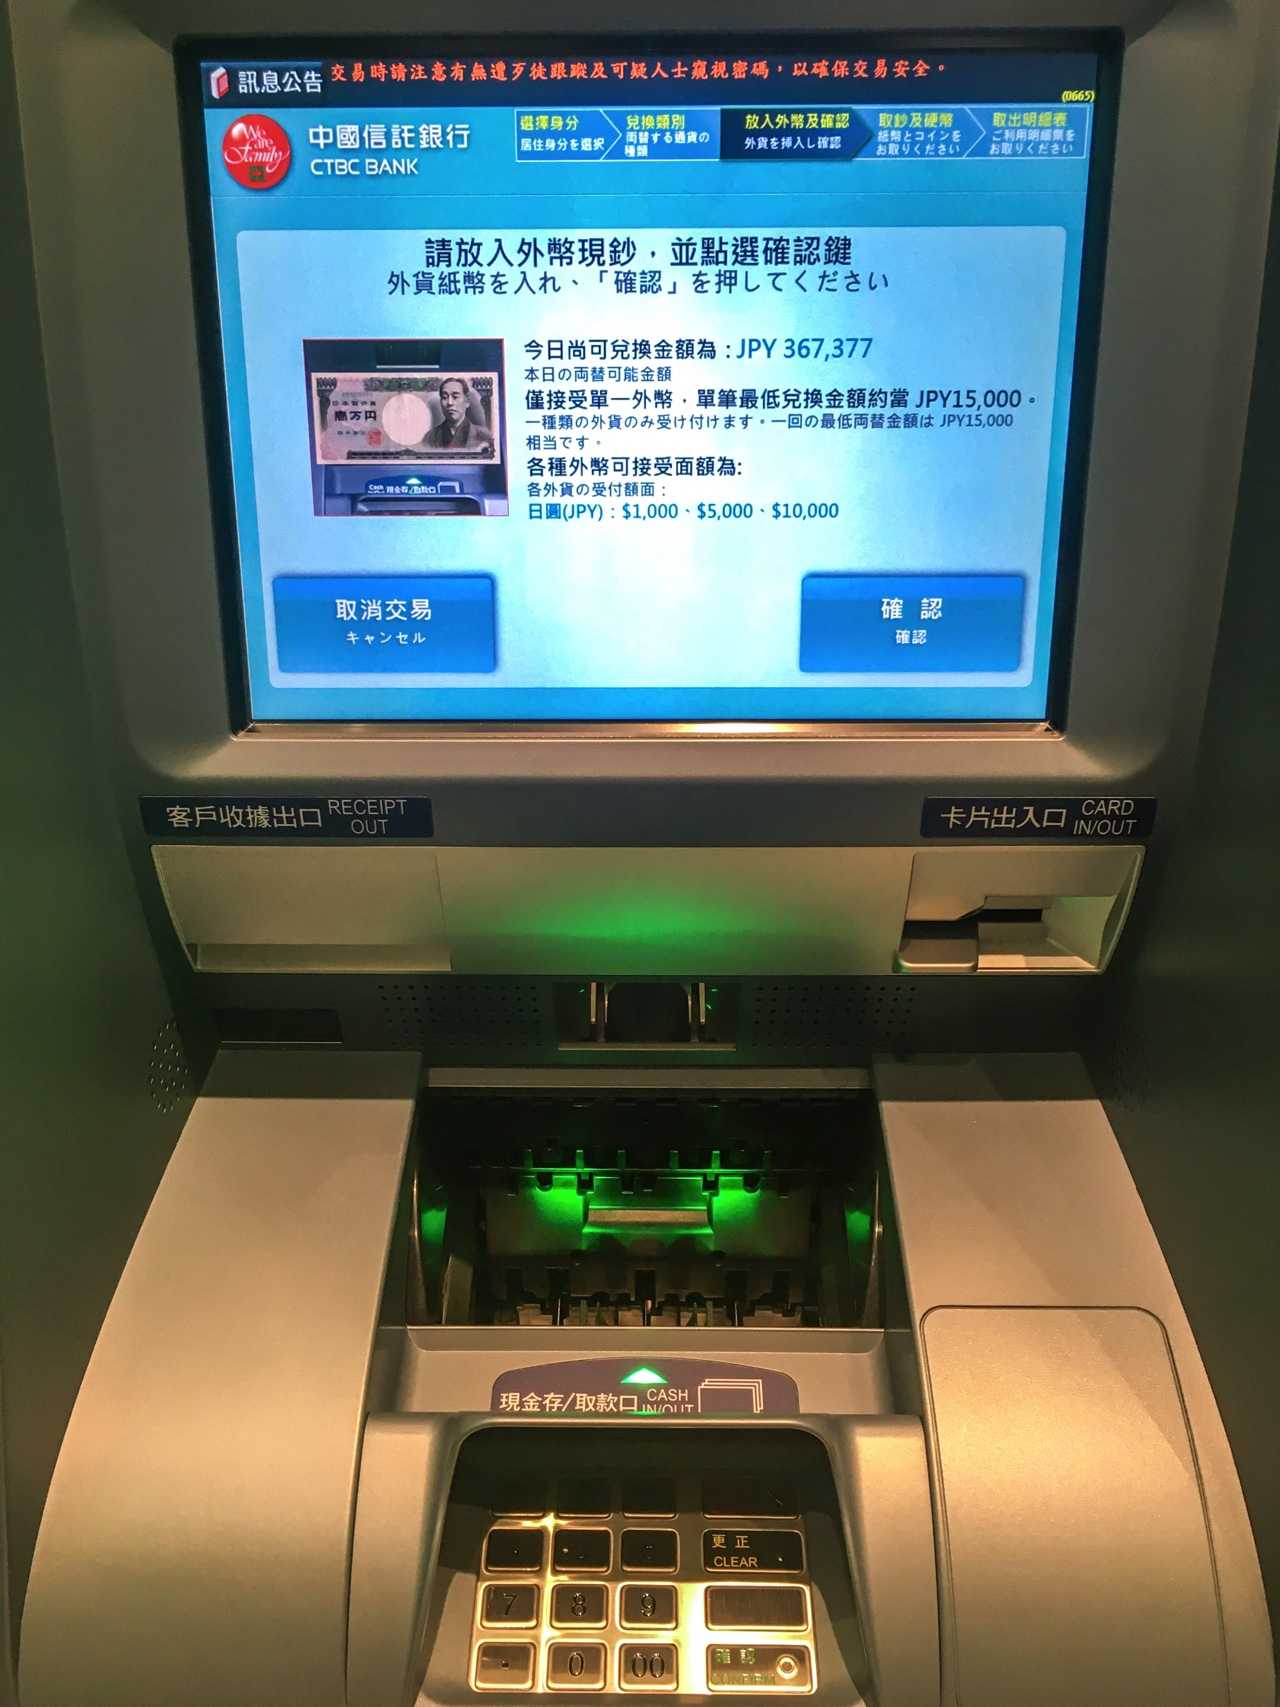 自動外貨両替機の画面07